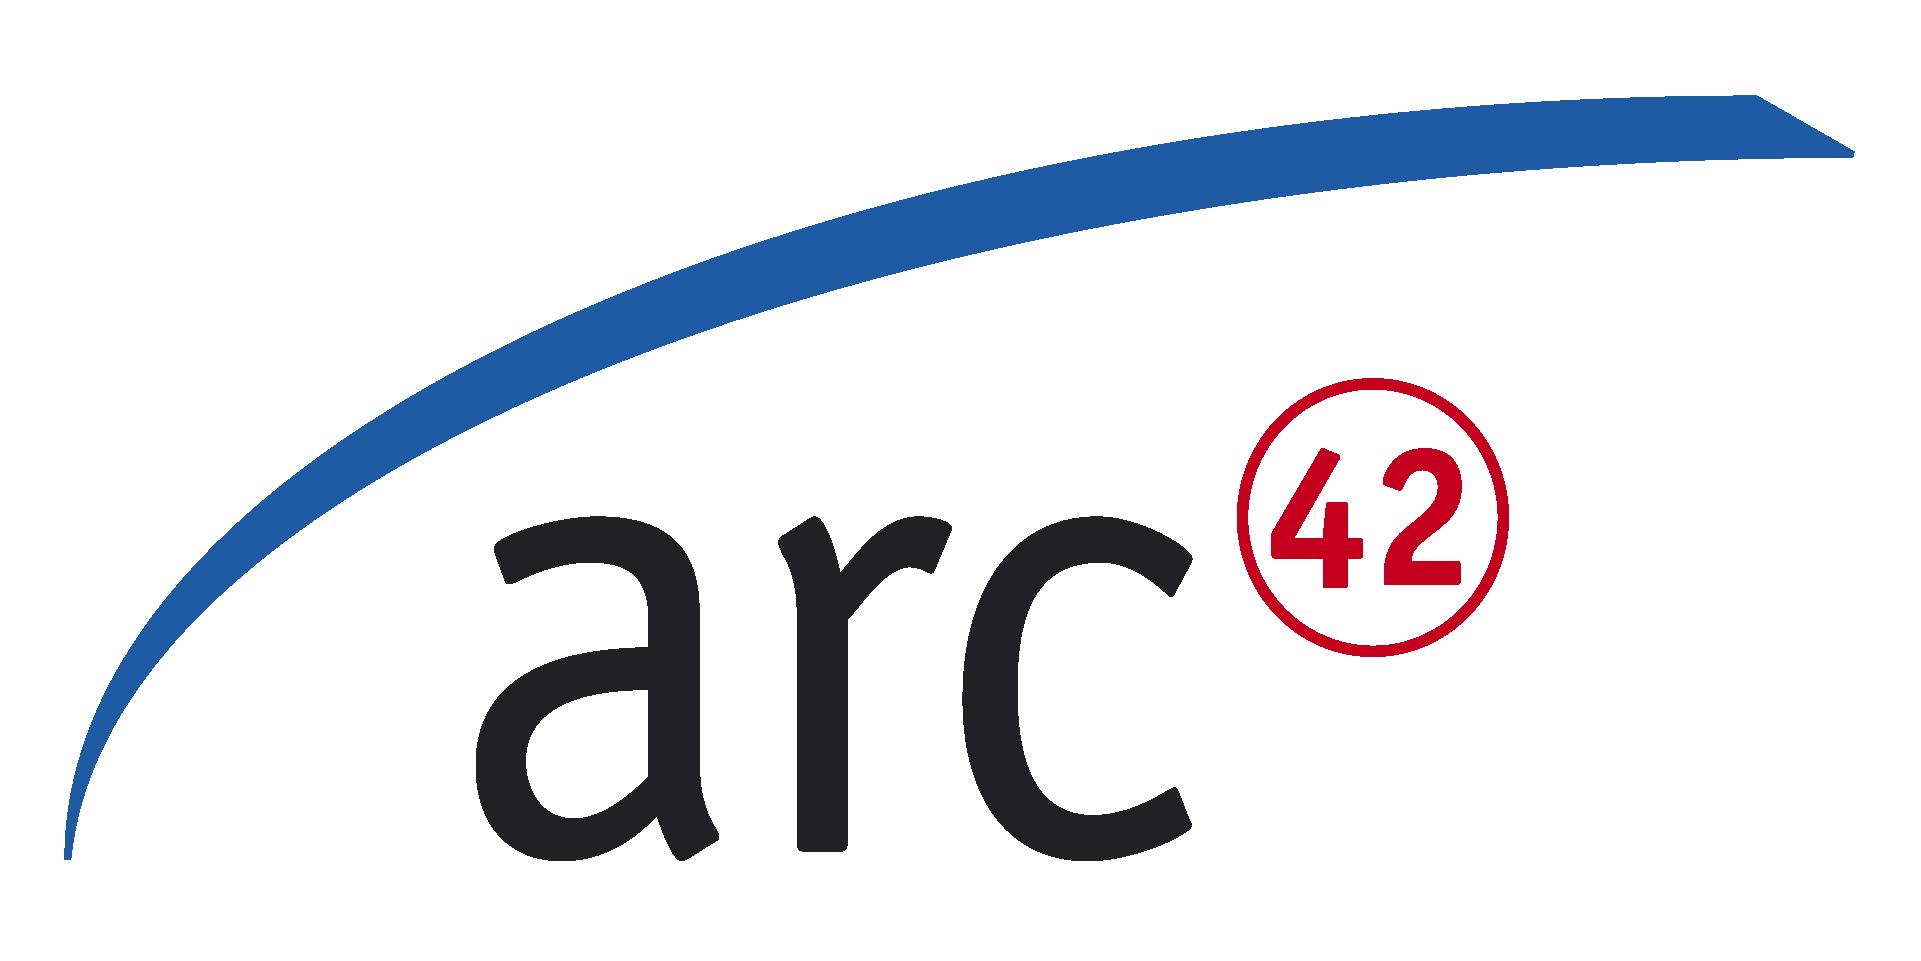 arc42 logo